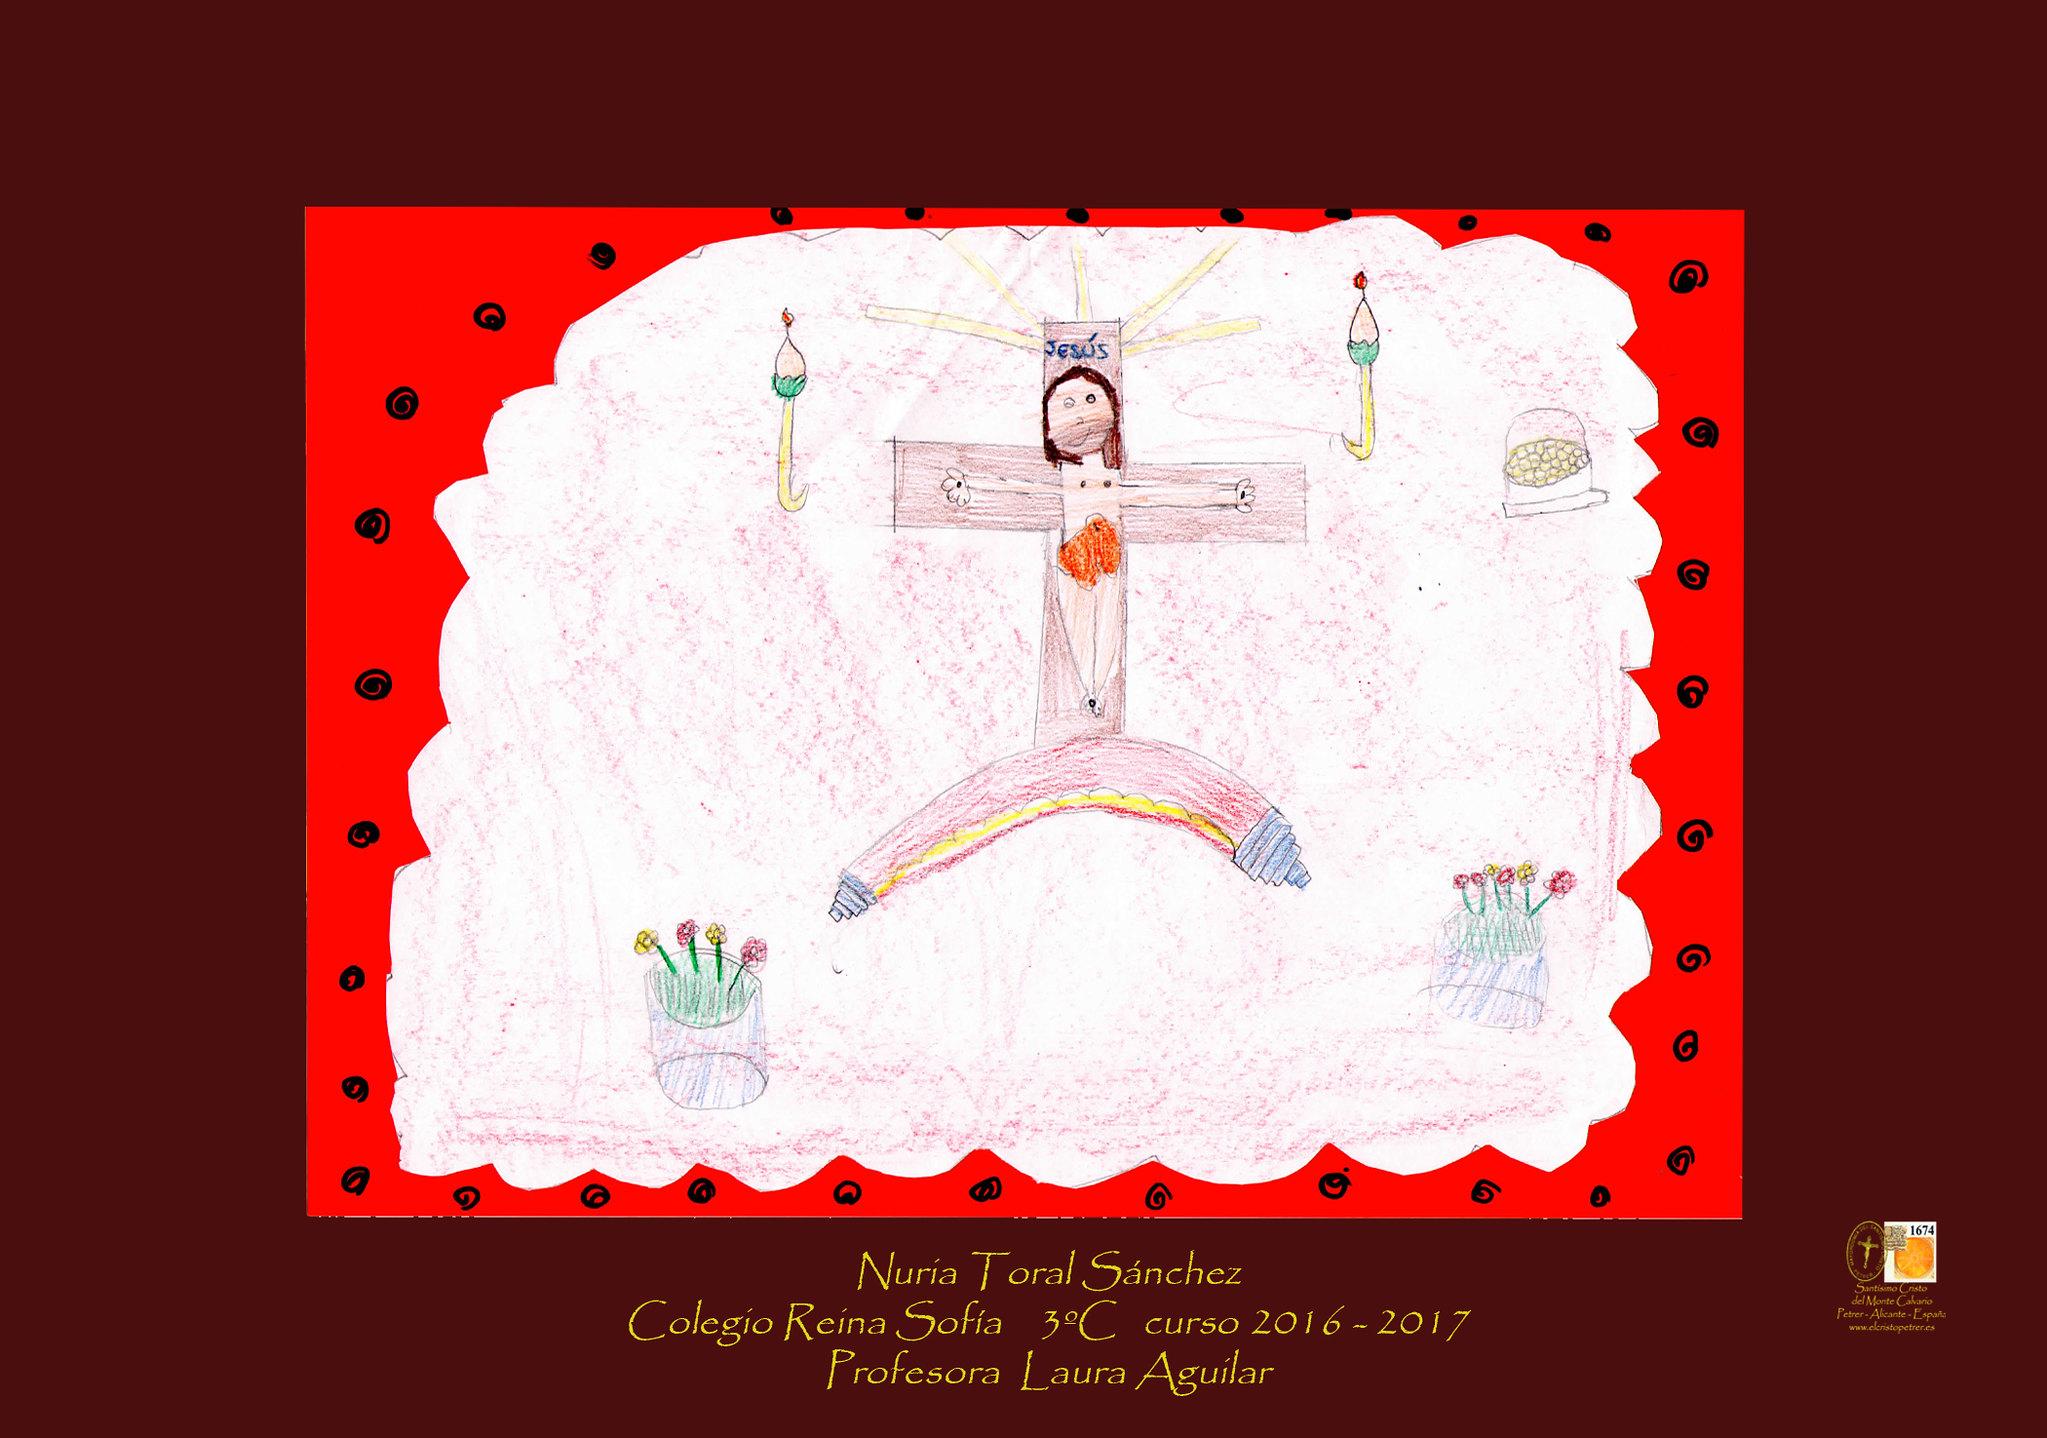 ElCristo - Actos - Exposicion Fotografica - (2017-12-01) - Reina sofía - 3ºC - Nuria Toral Sánchez